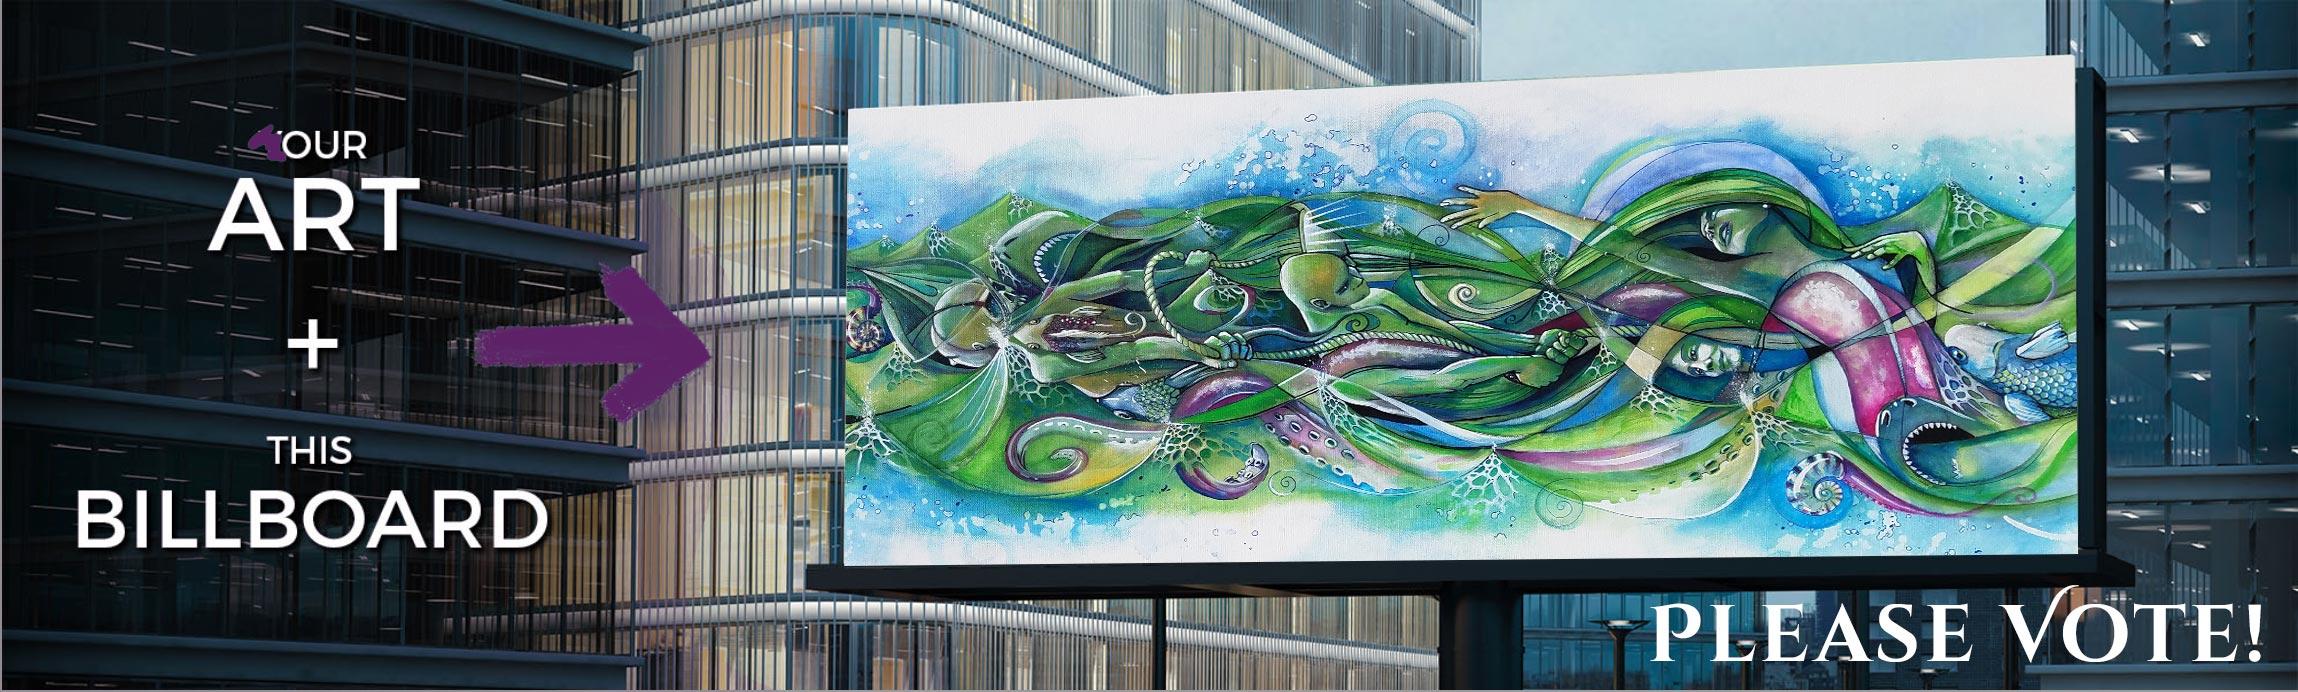 Please Vote My Art onto a Billboard | Pixels.com | Massive Burn Studios